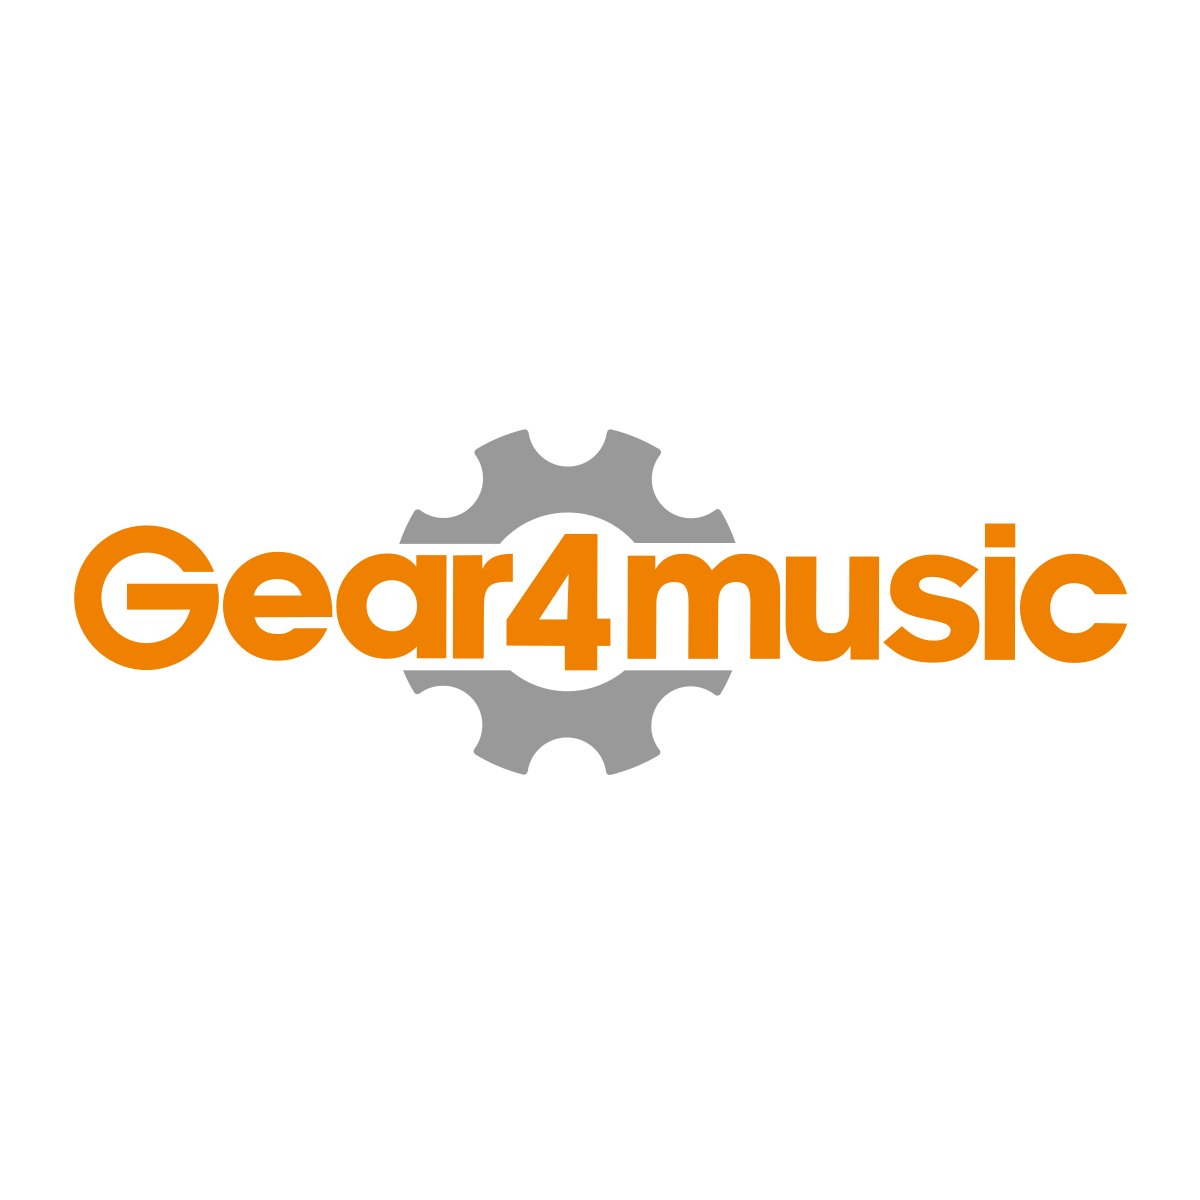 LA Electric Guitar Gear4music, Union Jack - B-Stock